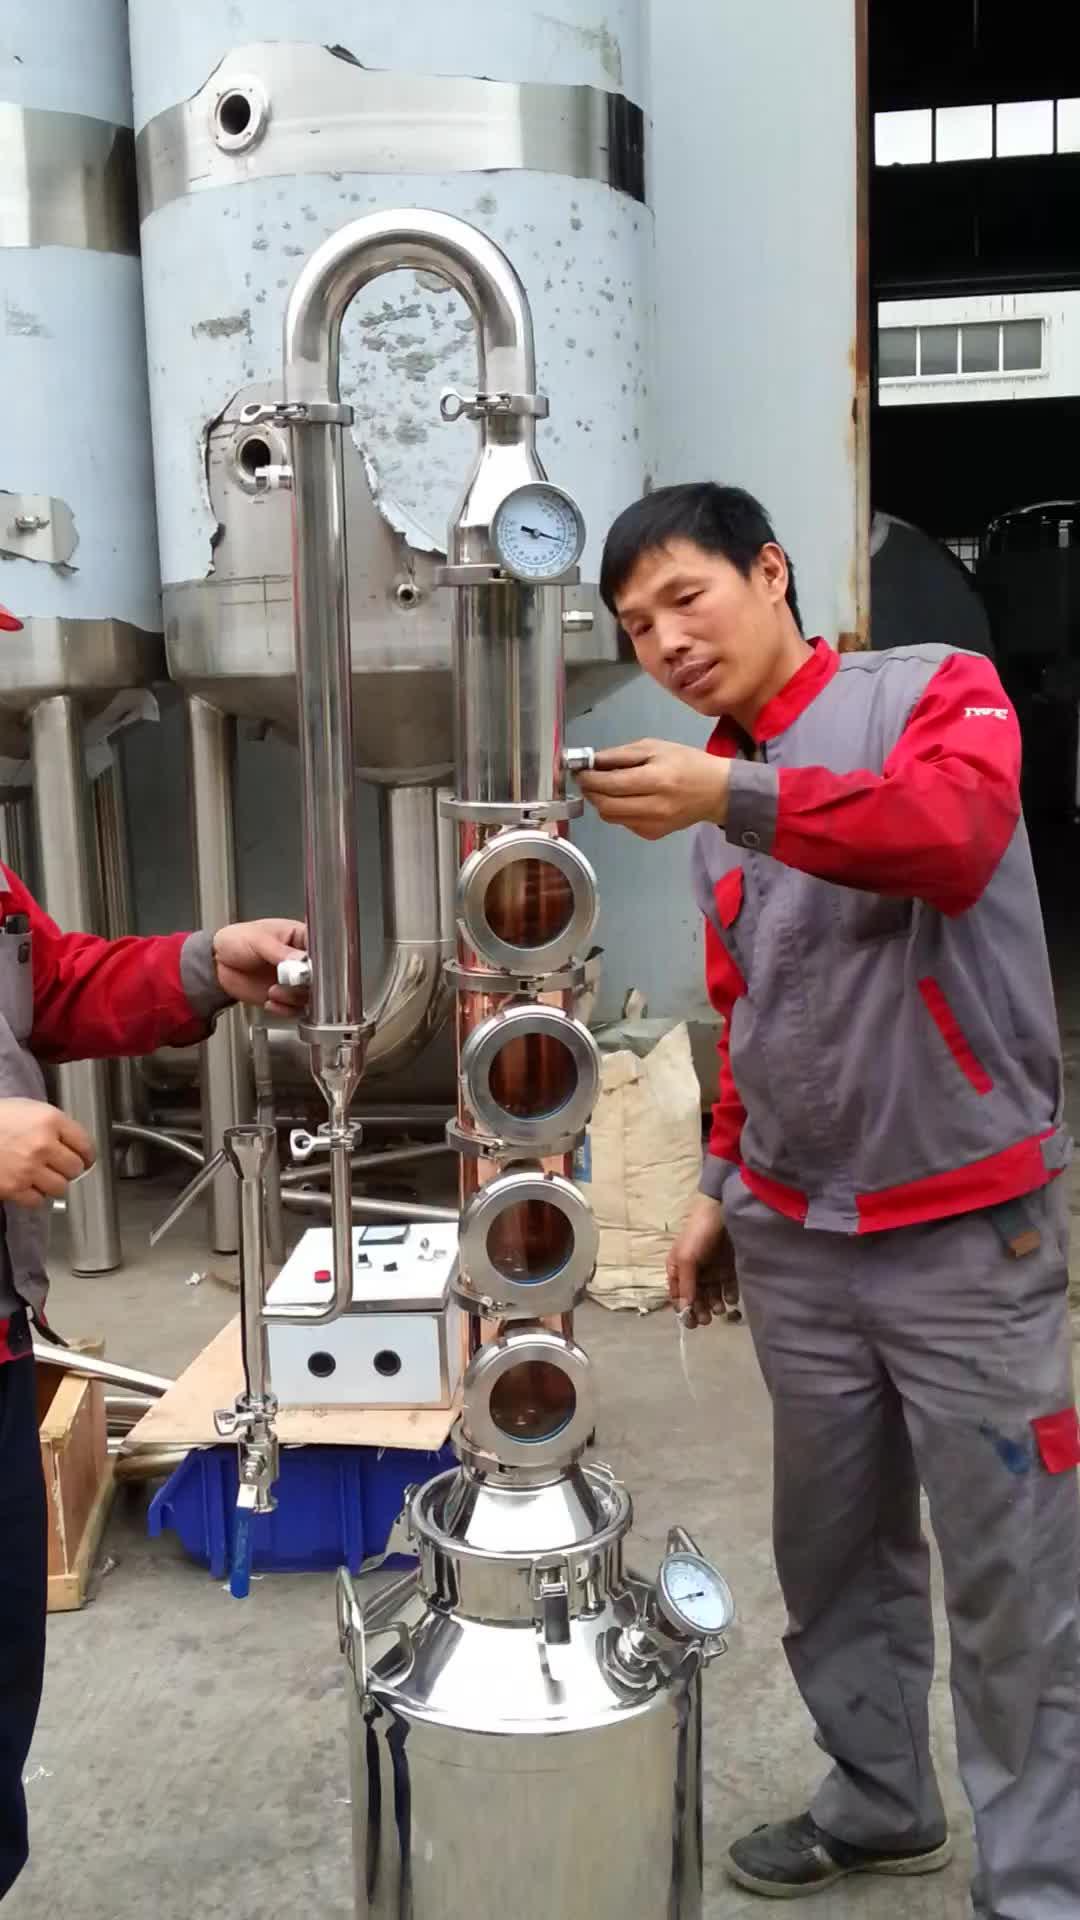 शराब इथेनॉल व्हिस्की संयंत्र बिक्री के लिए तांबा जिन अभी भी शराब खींचनेवाला